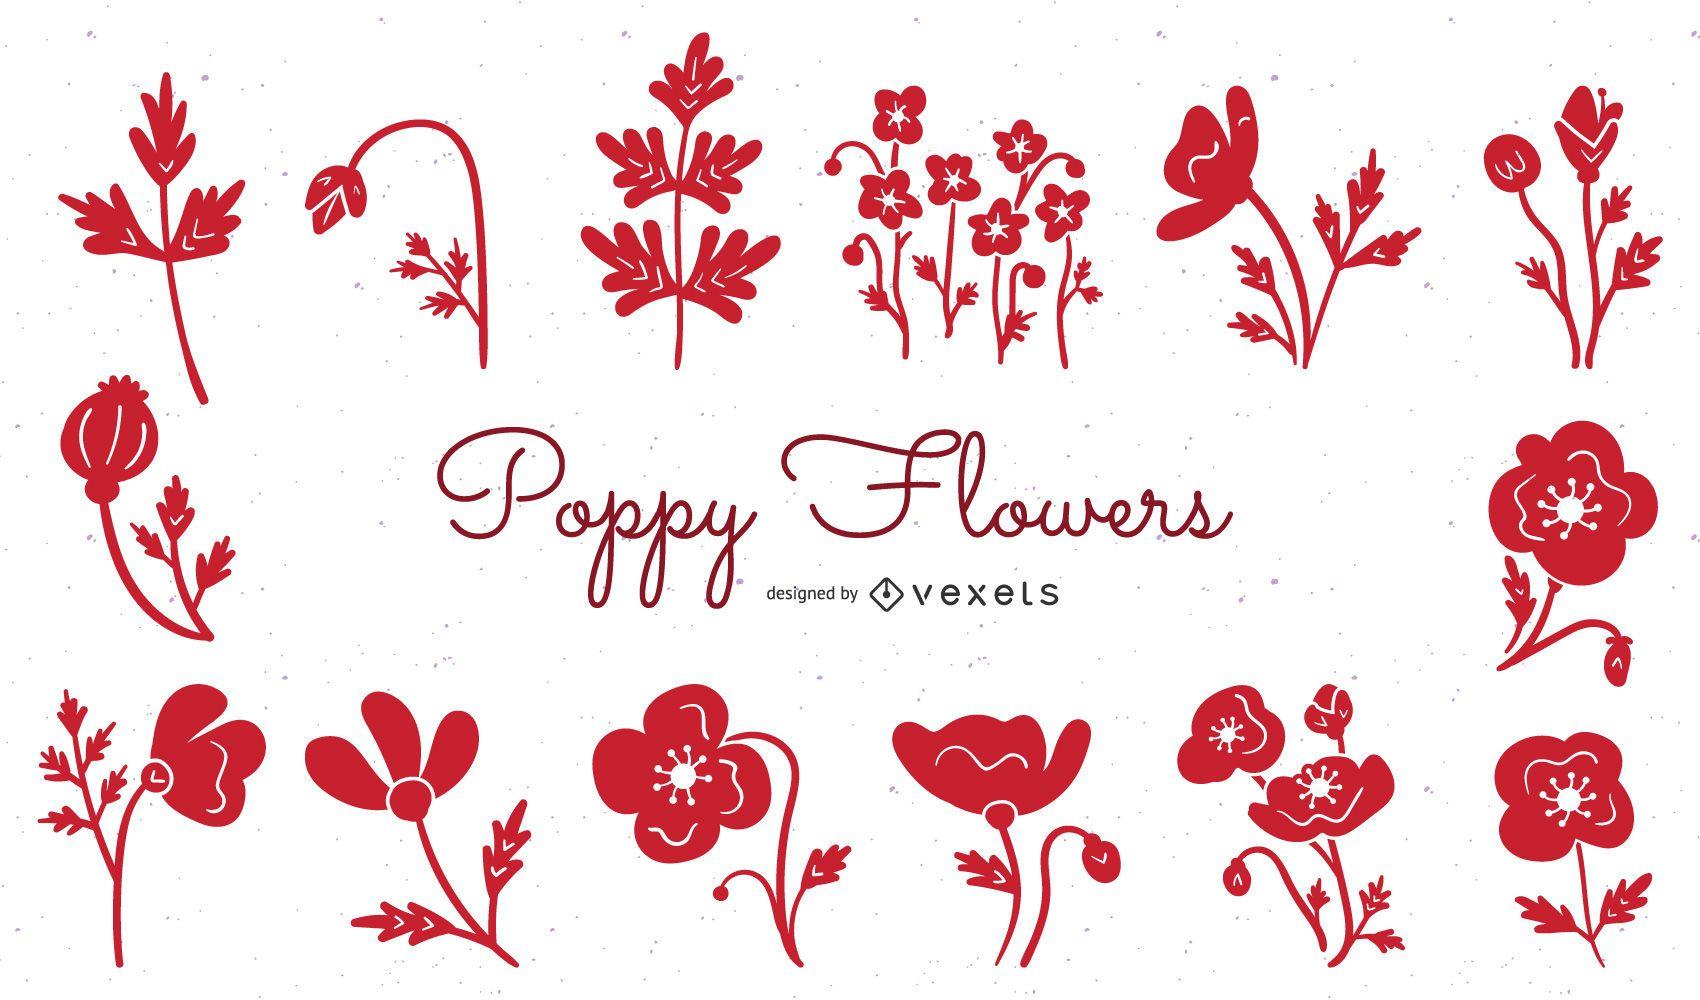 Poppy flowers red illustration set